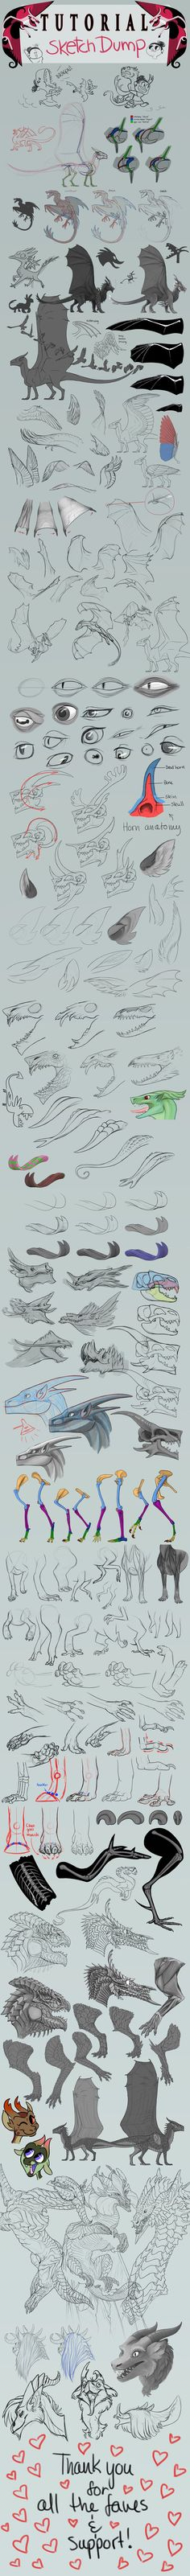 Some anatomy. Dragons resources! by SammyTorres